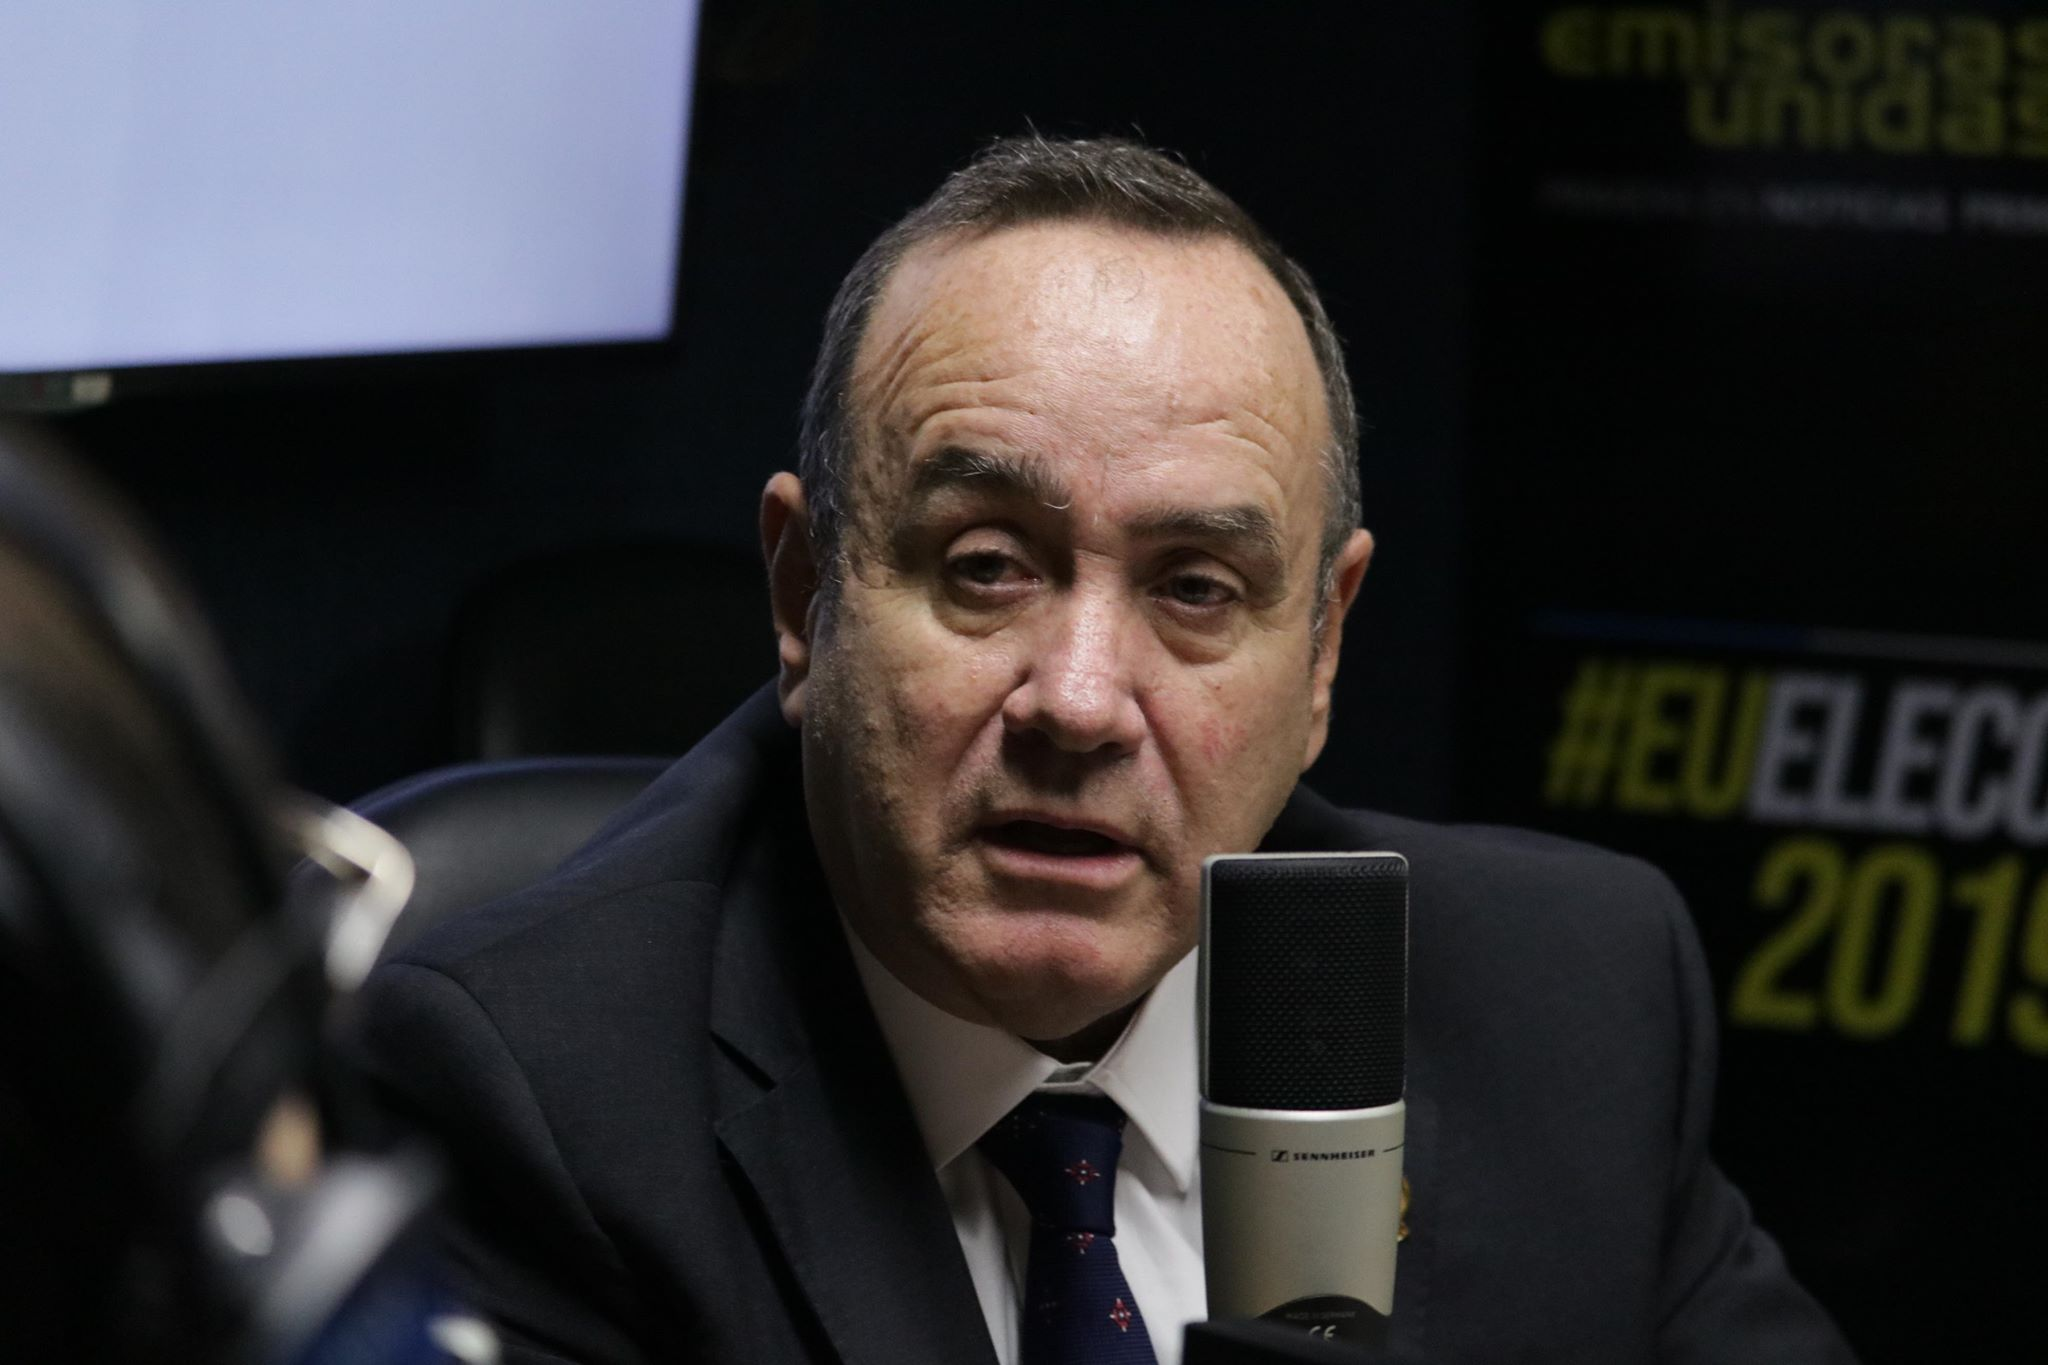 Alejandro Giammattei, candidato a presidente de Vamos. Foto: Alejandro Chet.